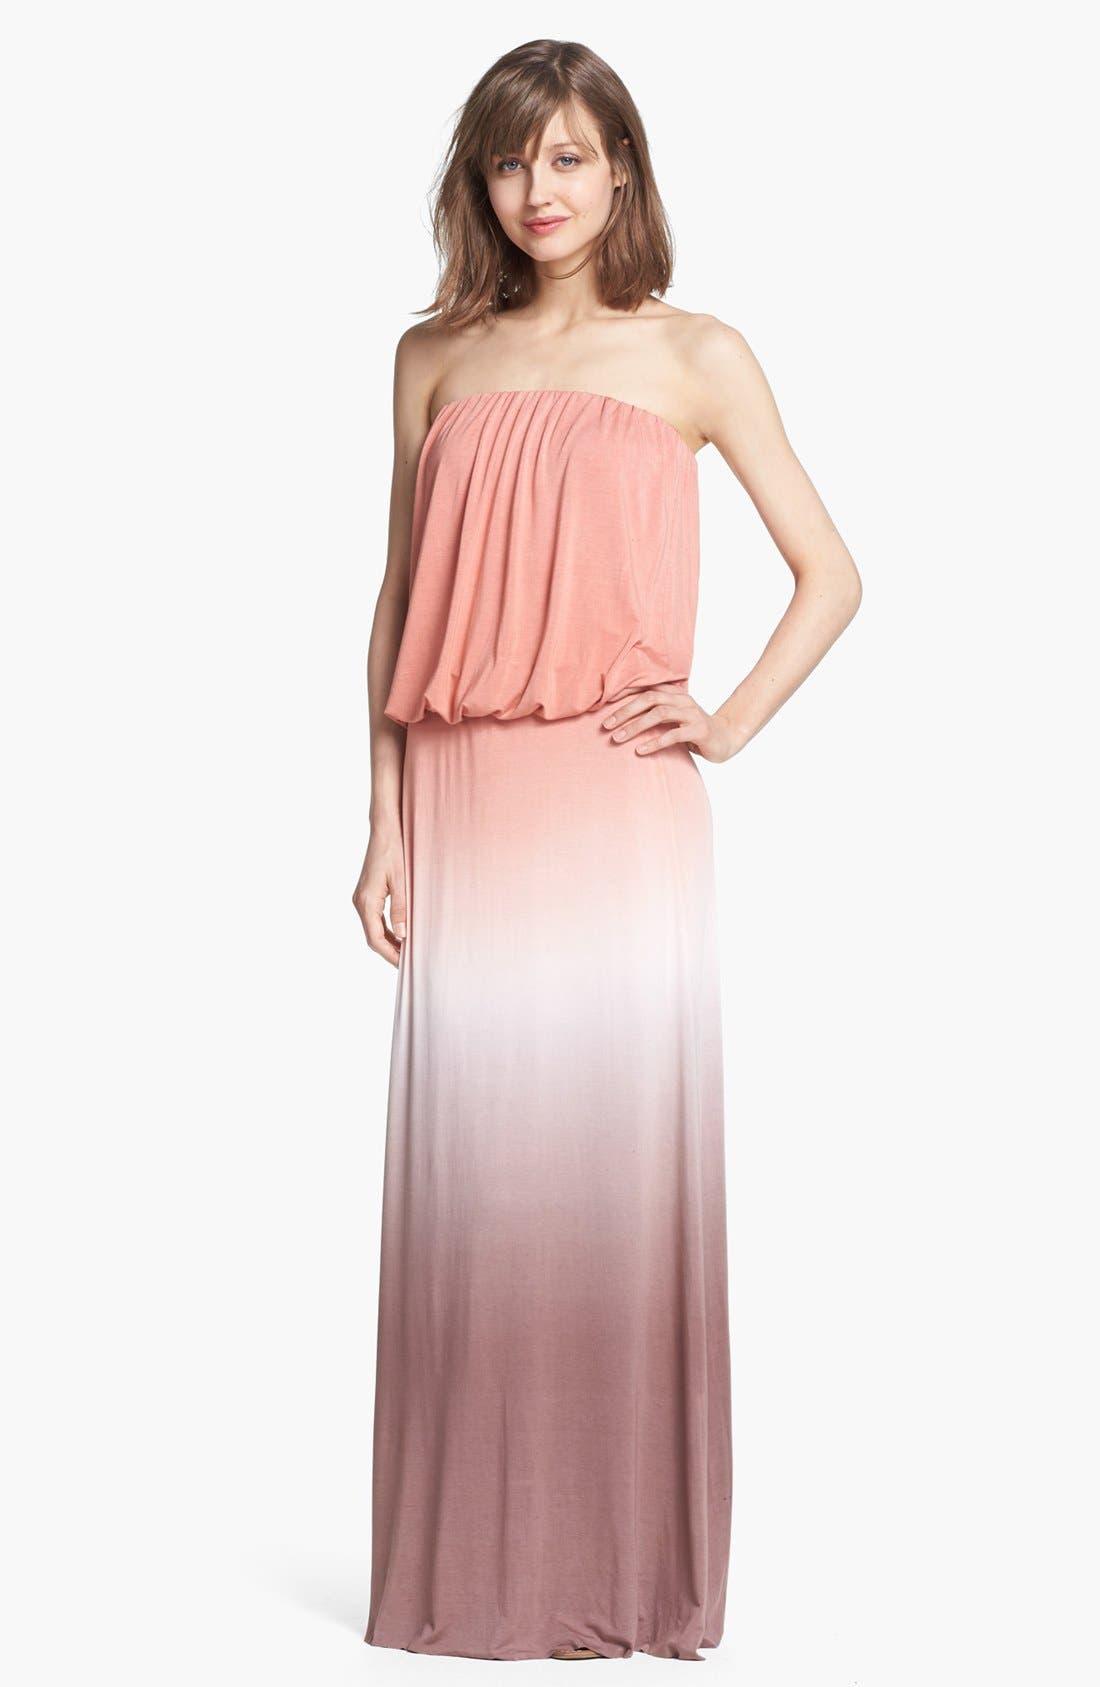 Main Image - Young, Fabulous & Broke 'Sydney' Ombré Maxi Dress